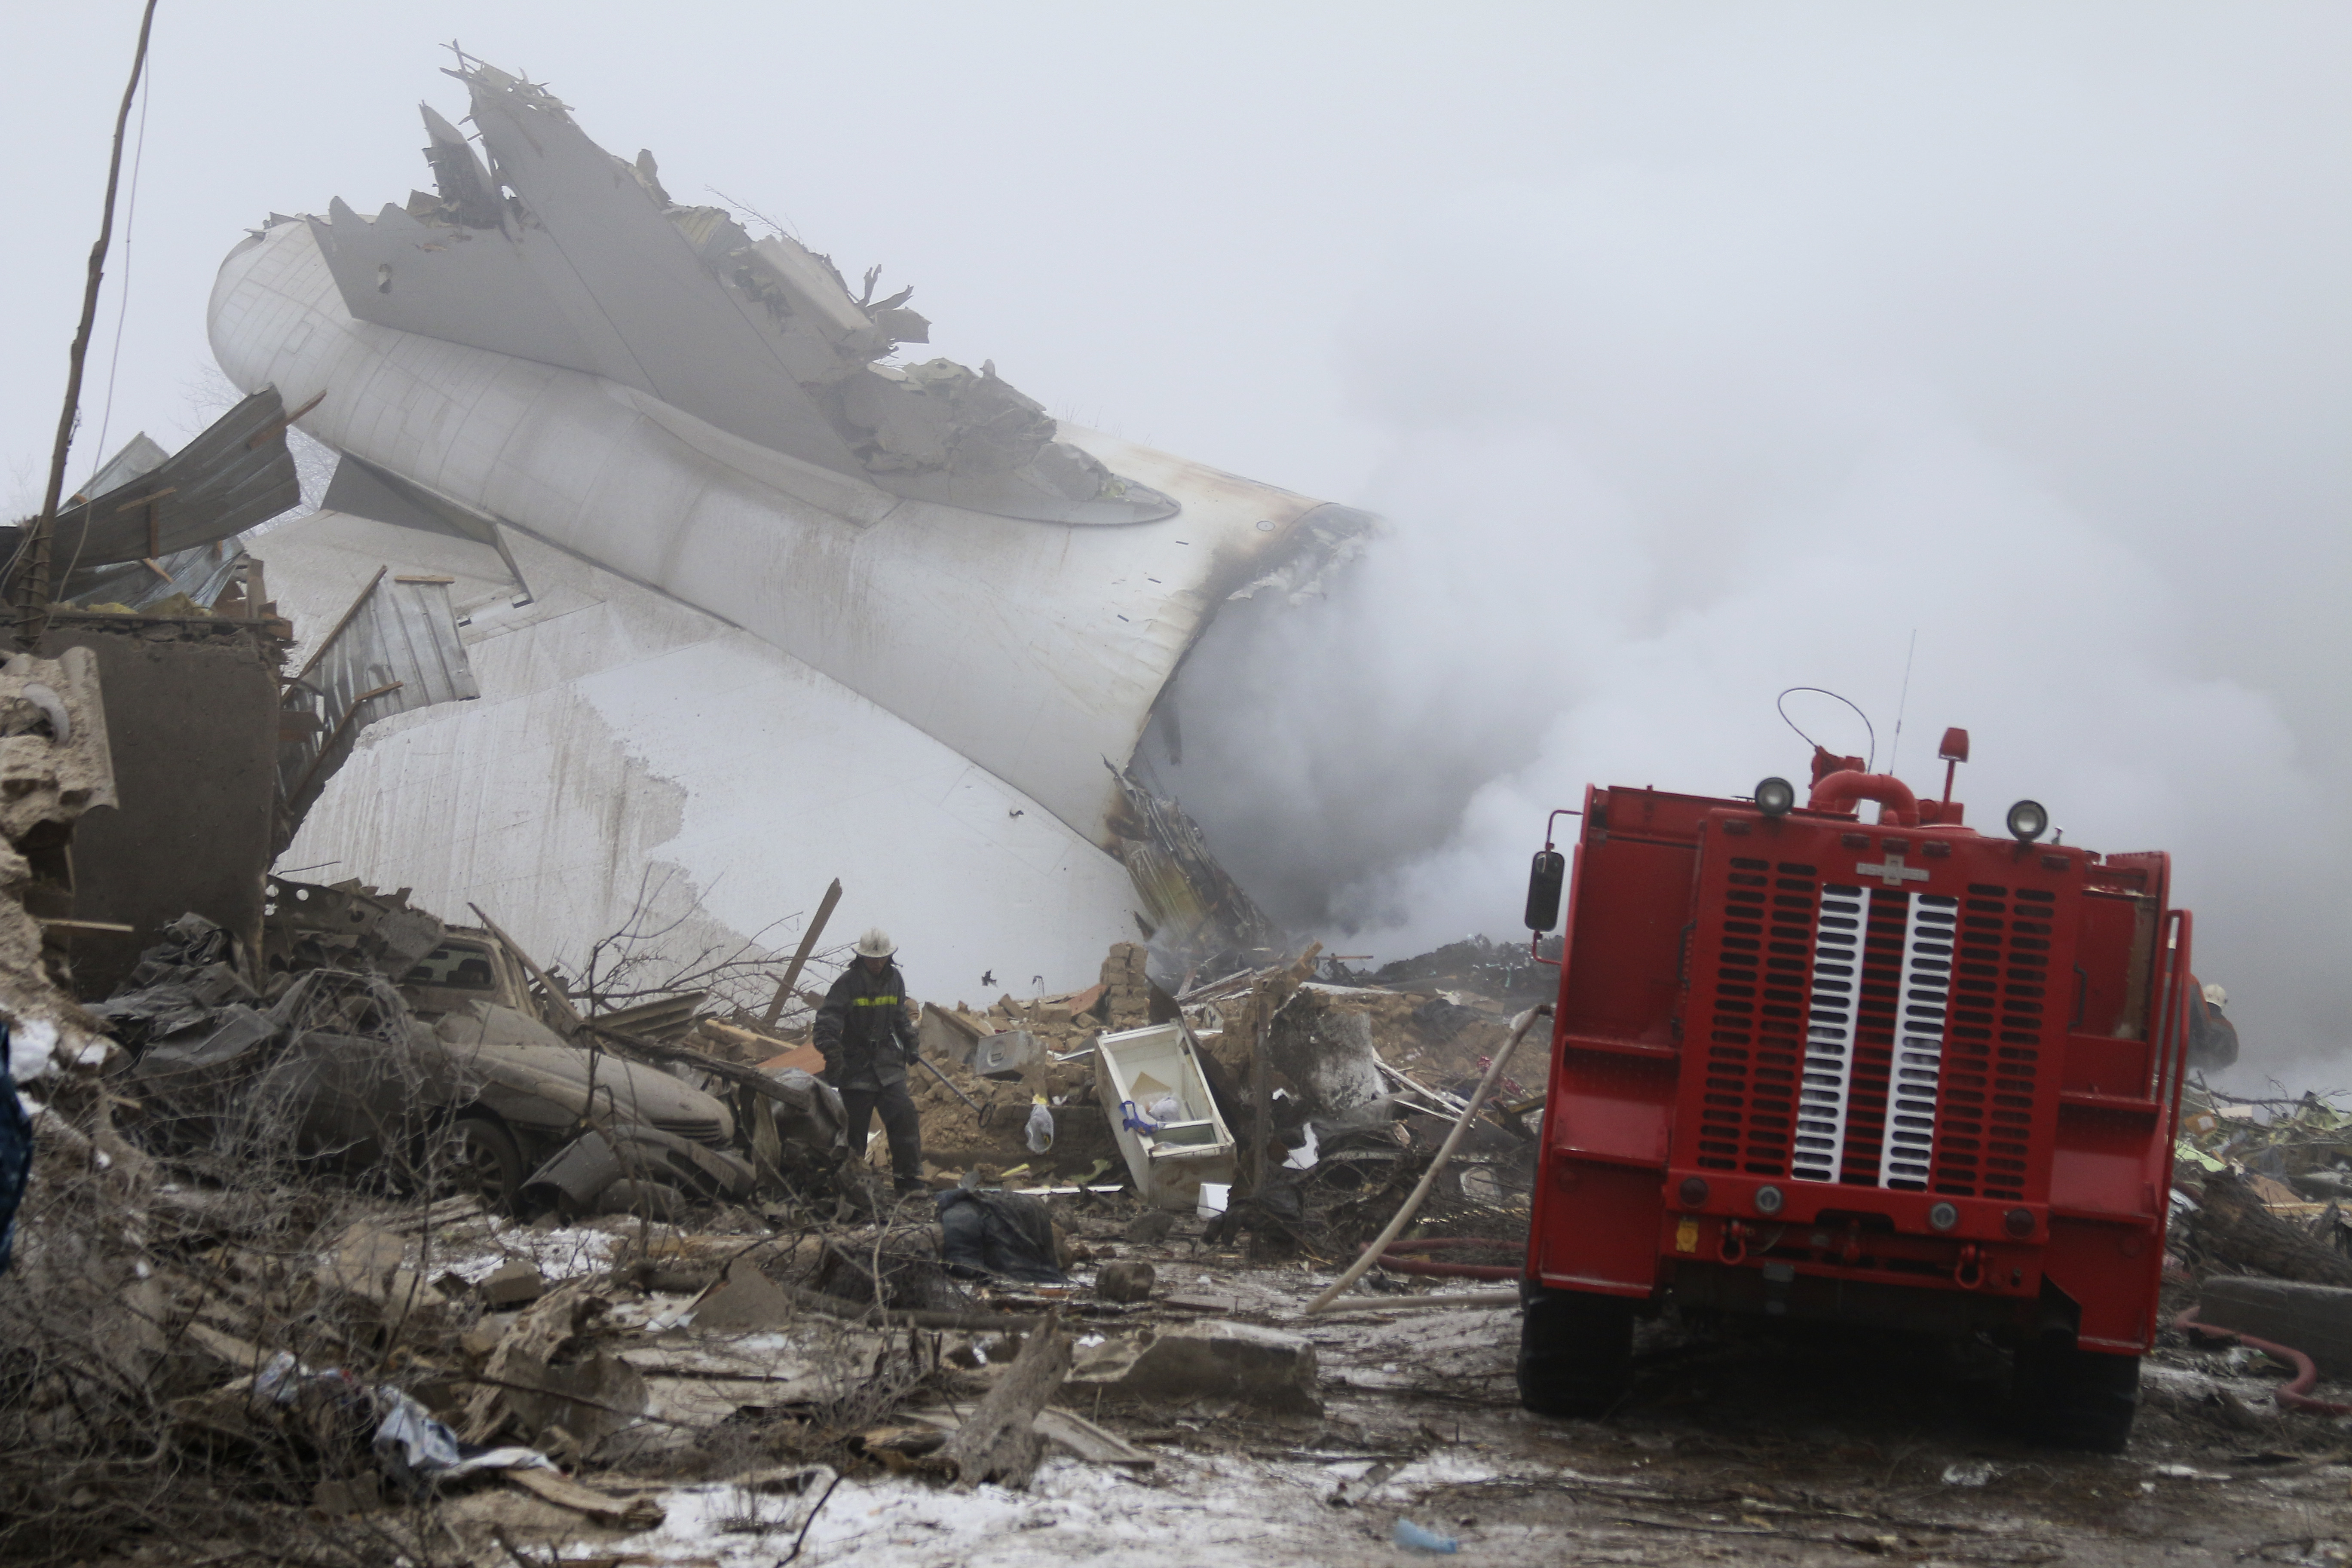 A Kyrgyz firefighter inspects a plane crash site outside Bishkek, Kyrgyzstan, Jan. 16, 2017.